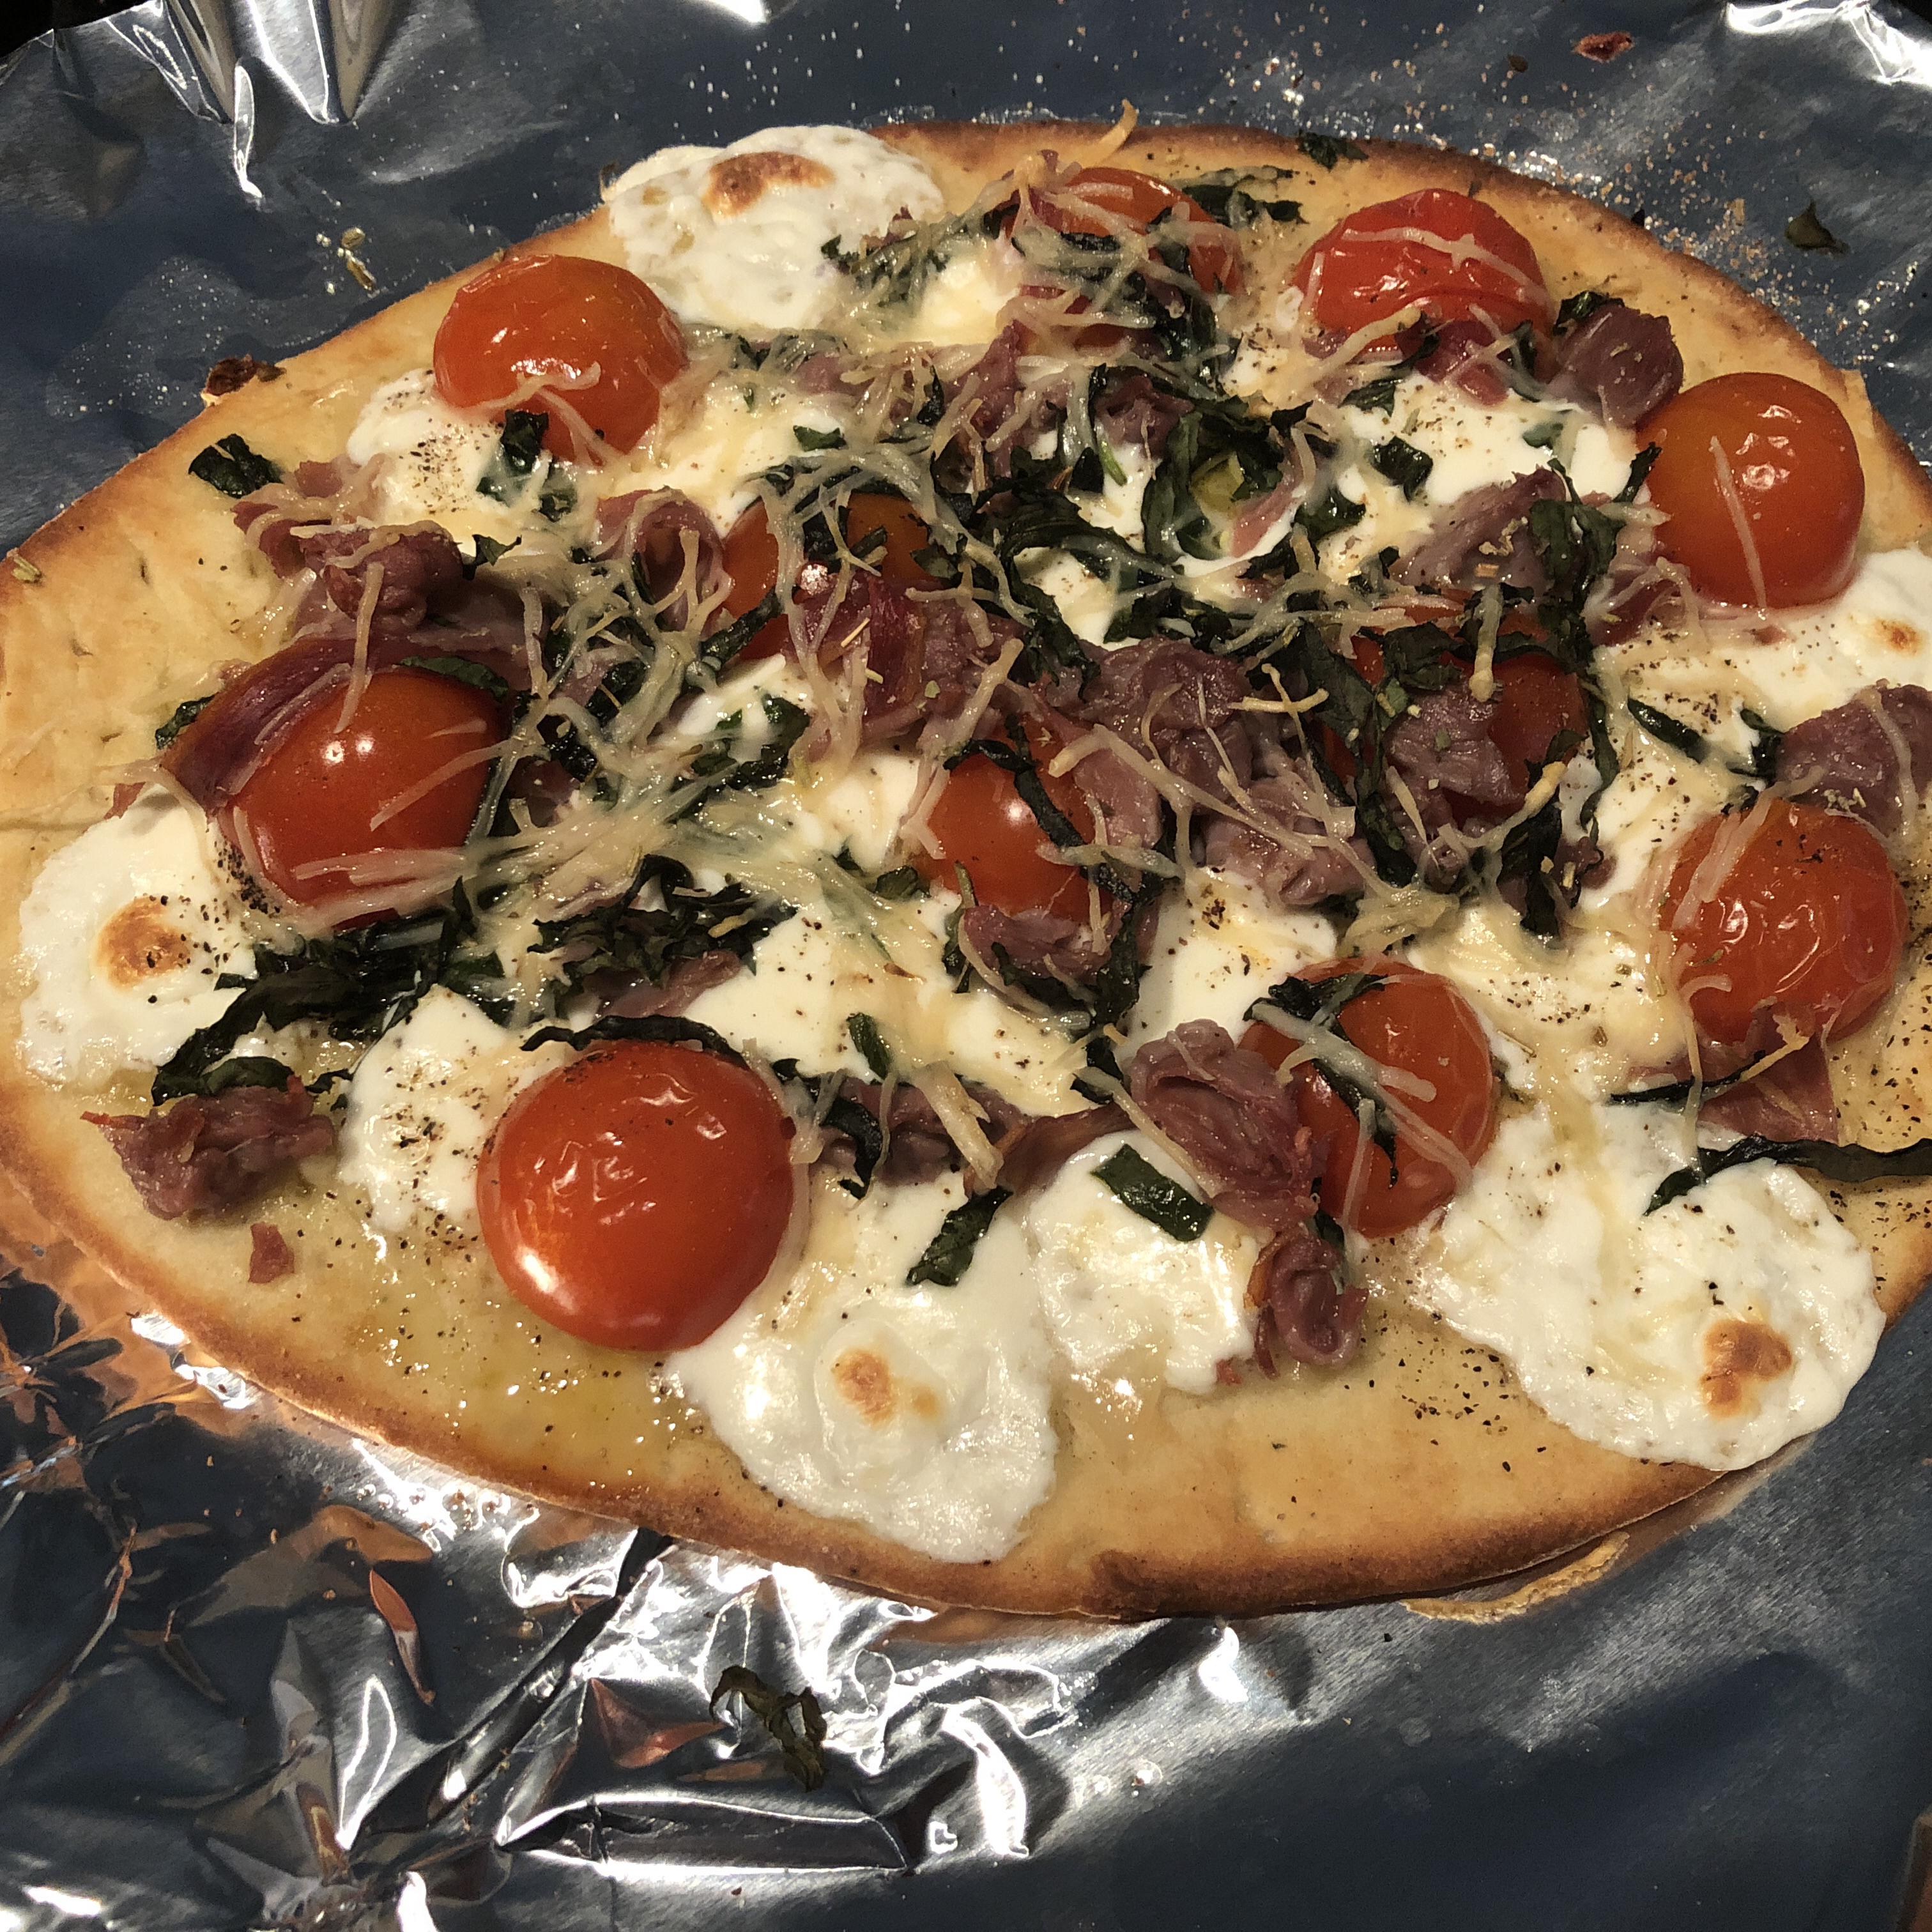 Naan Bread Margherita Pizza with Prosciutto jrcurtis78